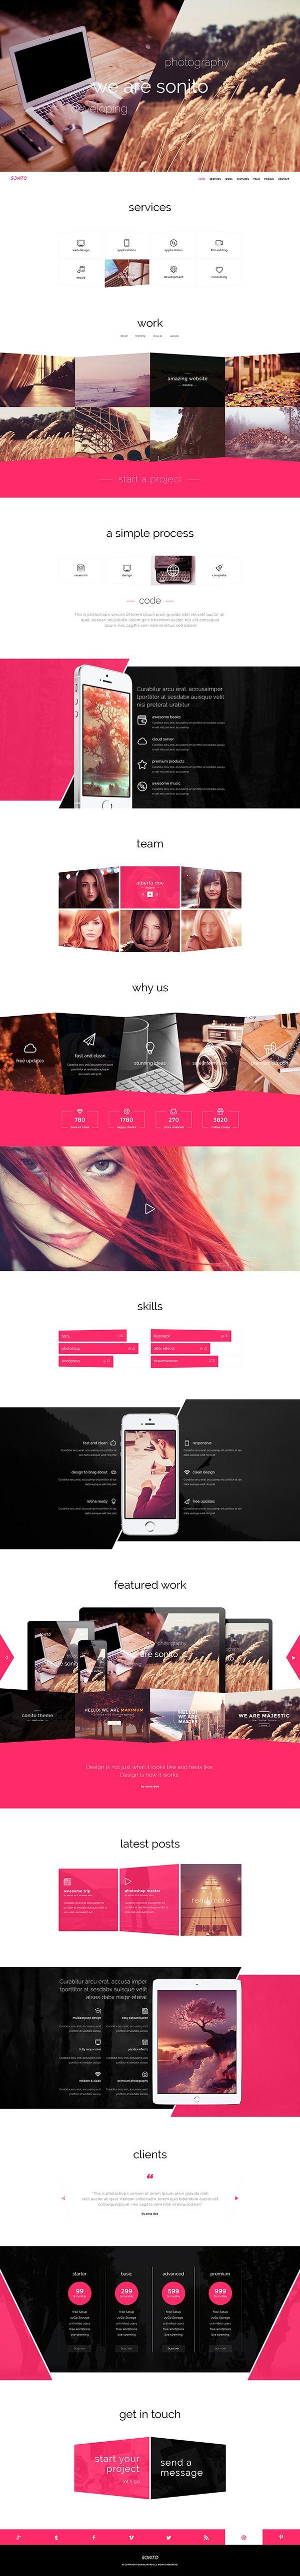 Sonito Web Theme on Behance